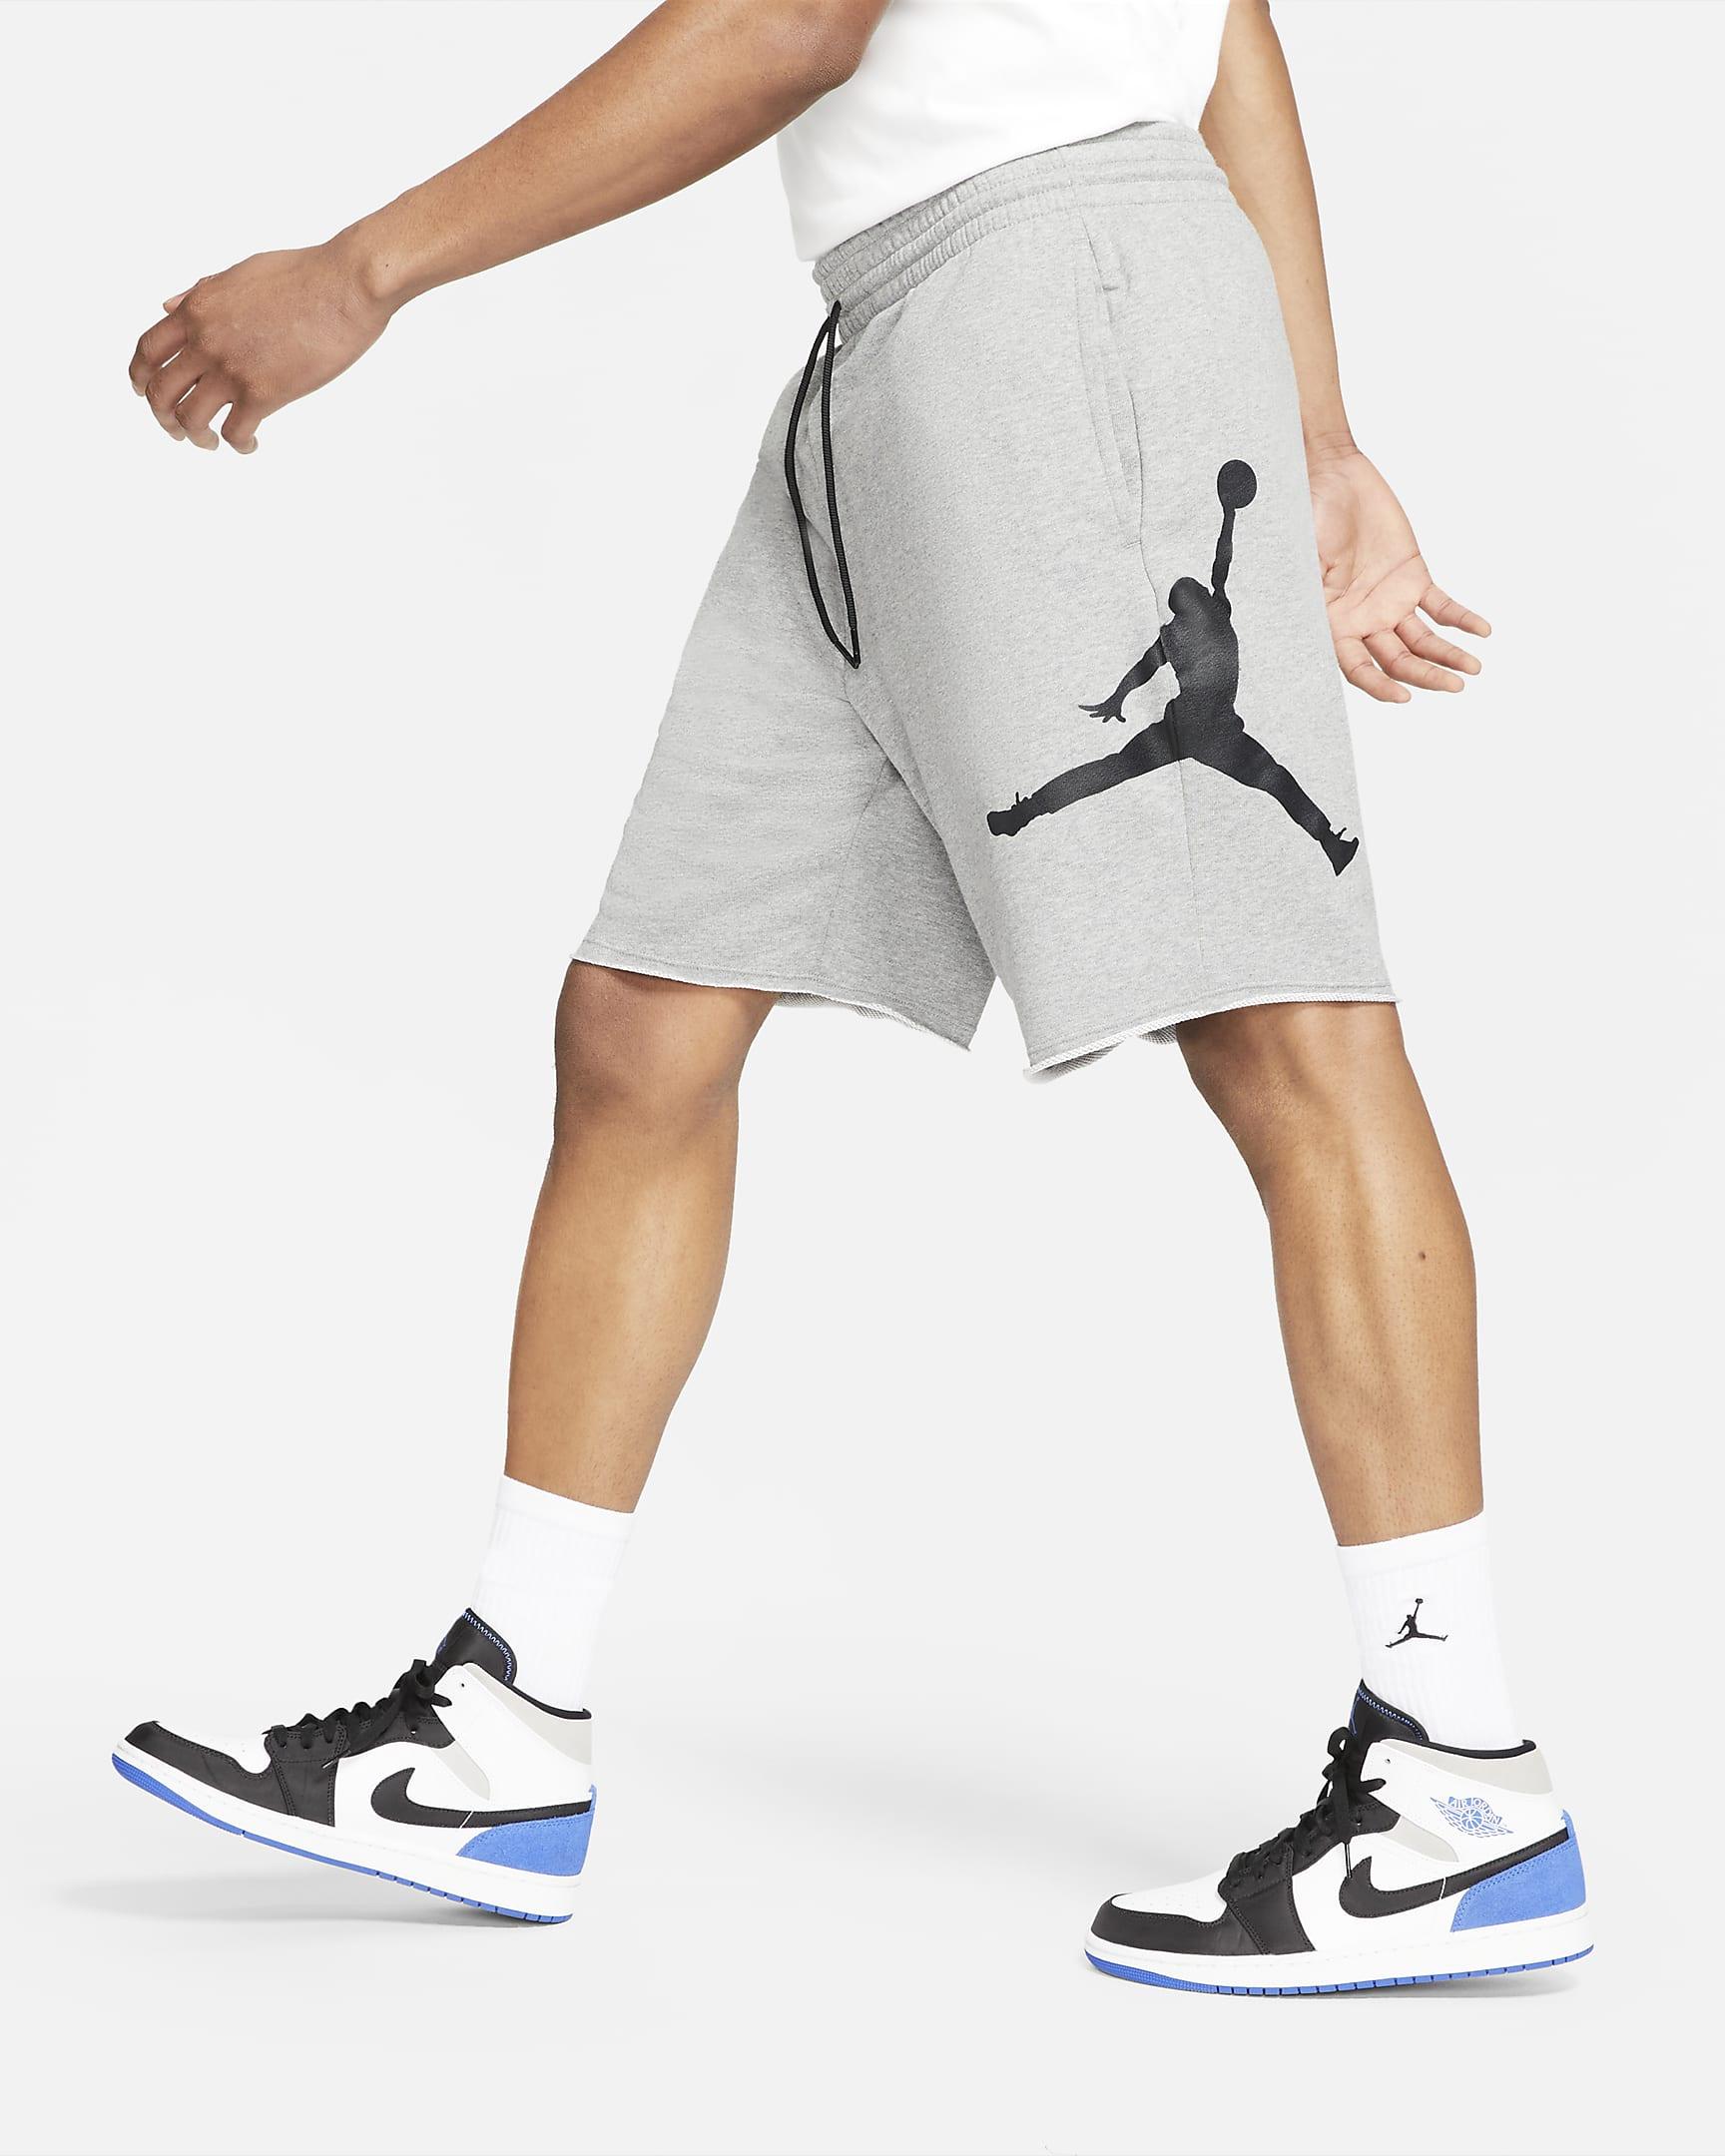 jordan-jumpman-logo-mens-fleece-shorts-5sVwDR.png